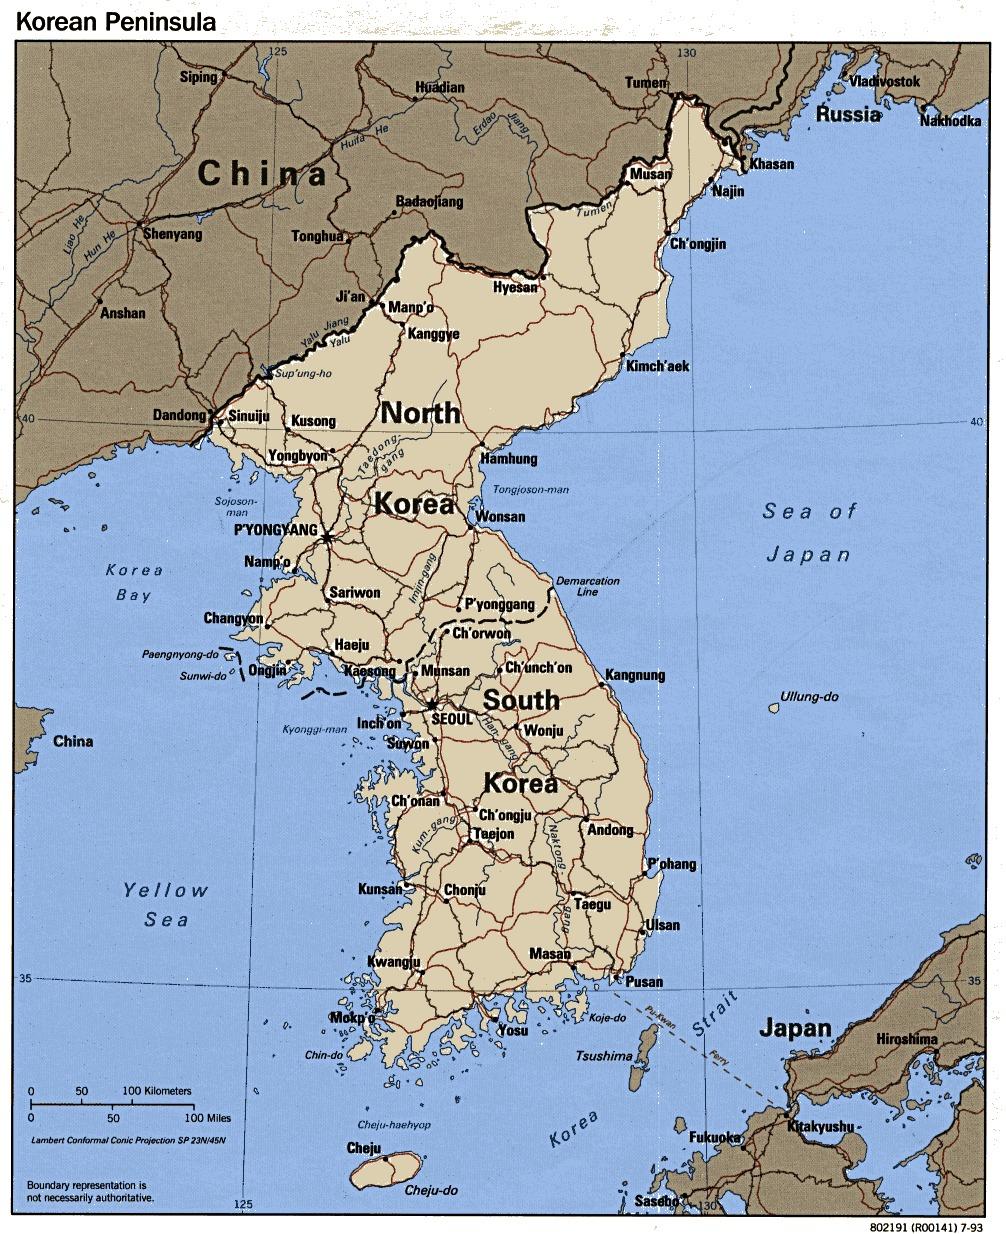 Mapa Politico de la Península de Corea